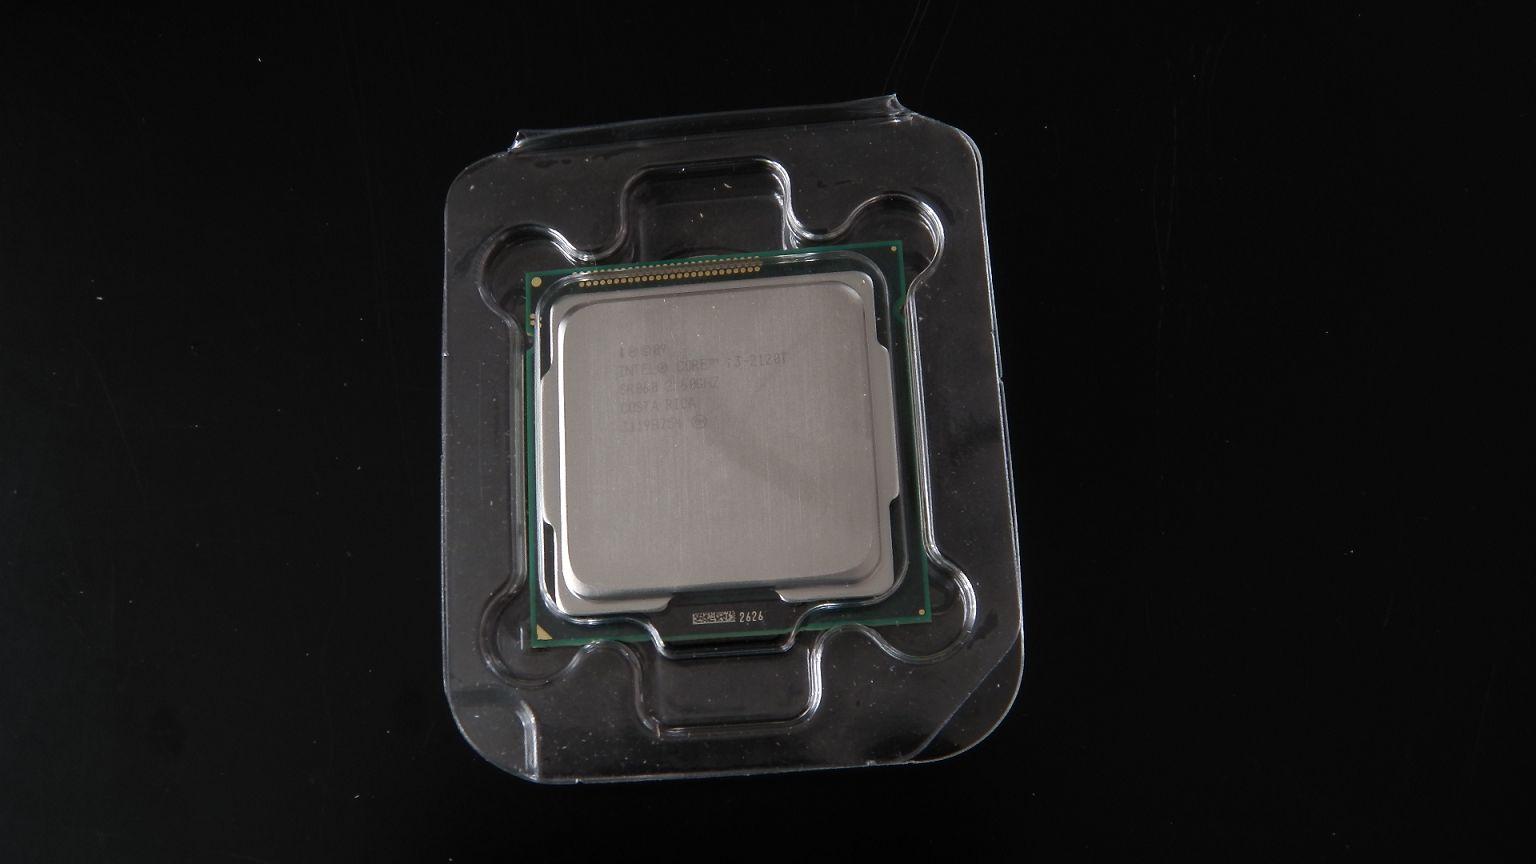 k-imga0288-jpg.475757